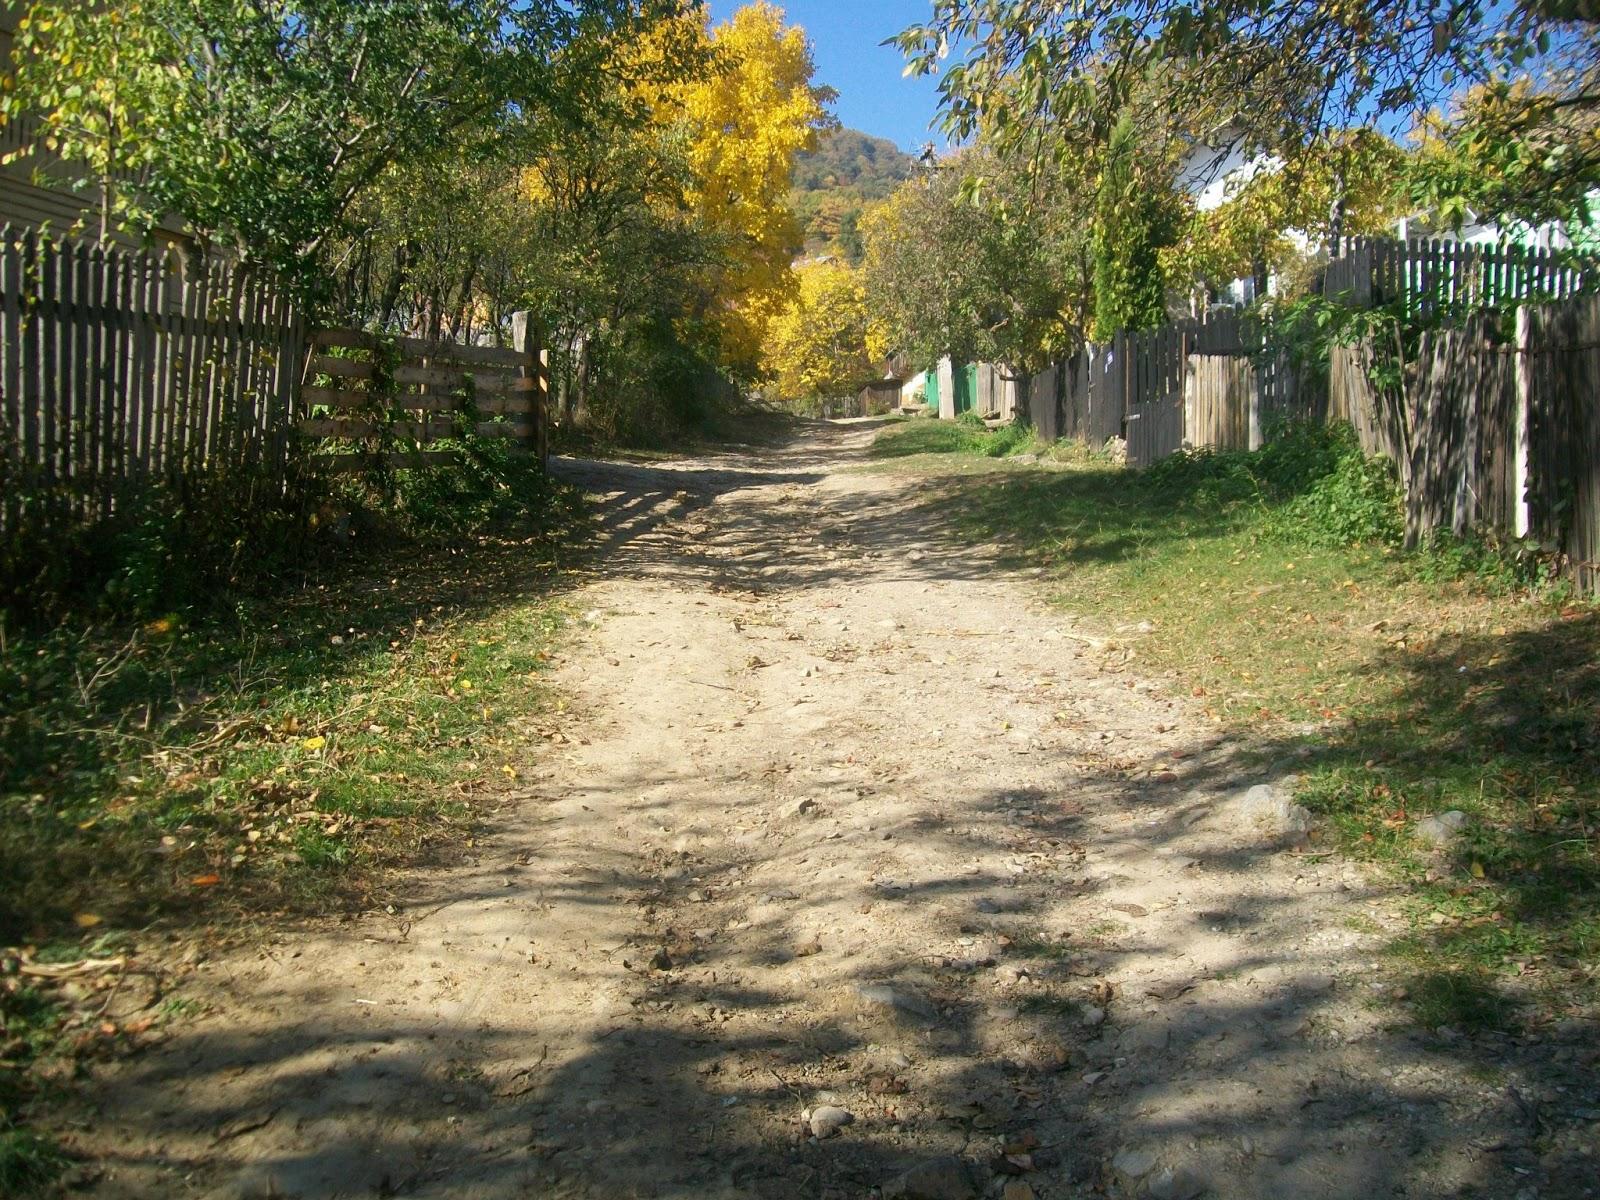 RO-MD/Moldova in Two Scenarios by rusu stefan - Issuu